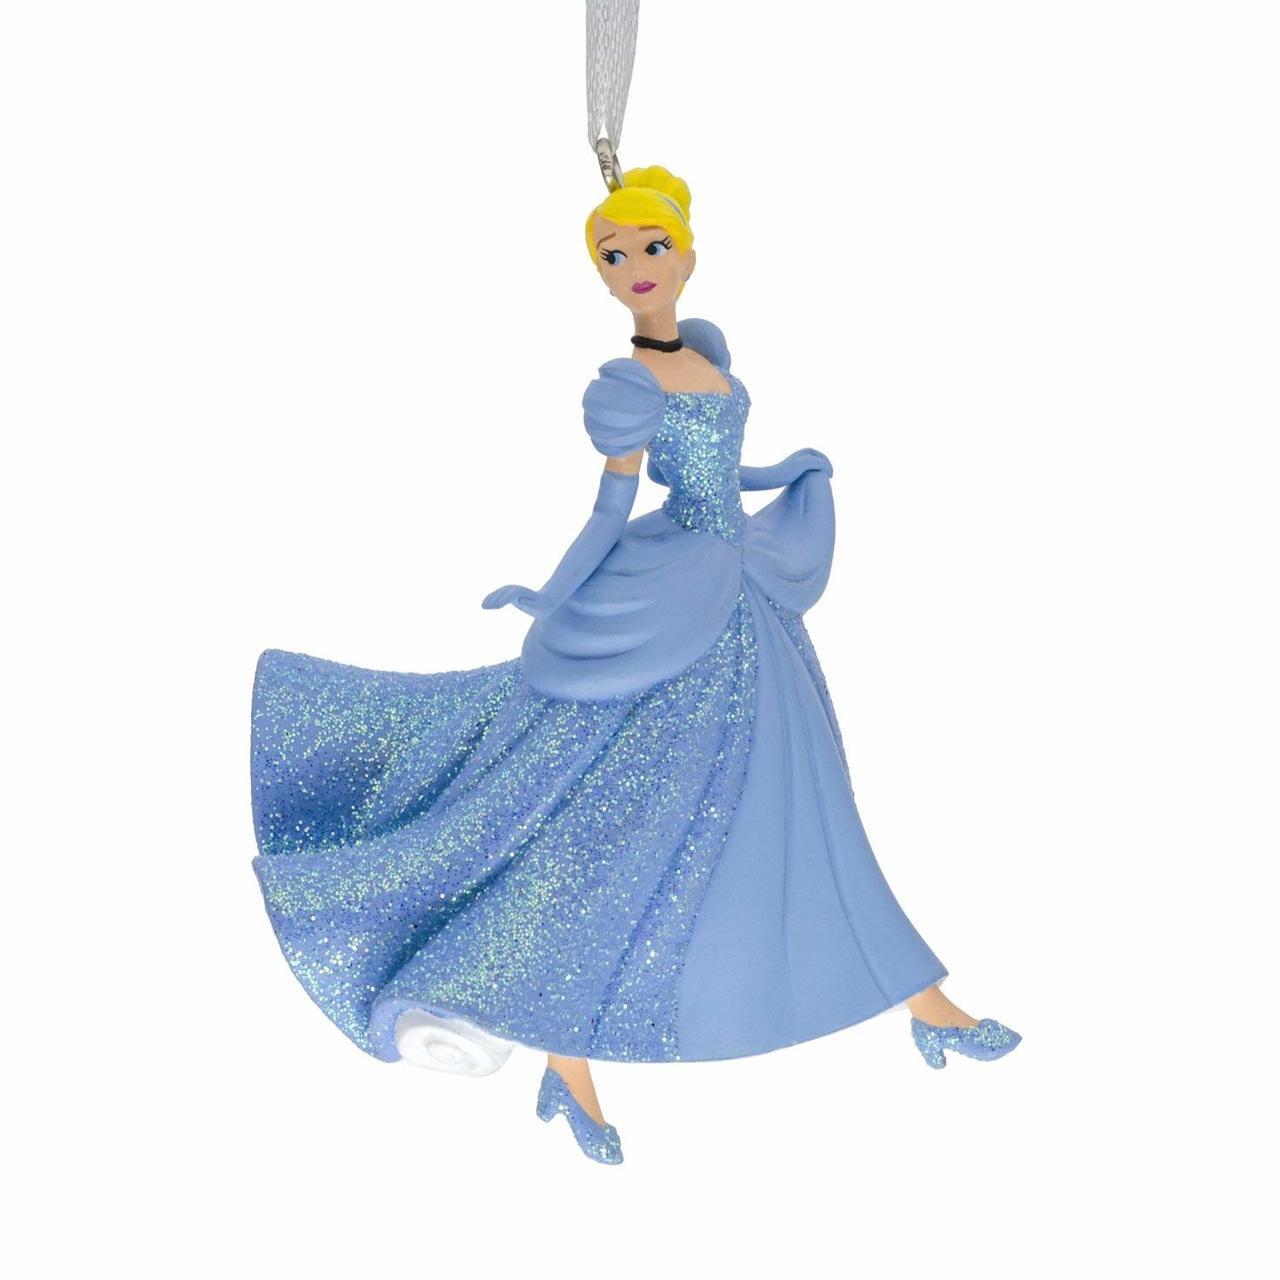 Cinderella Christmas.Hallmark Disney Princess Cinderella Christmas Ornaments